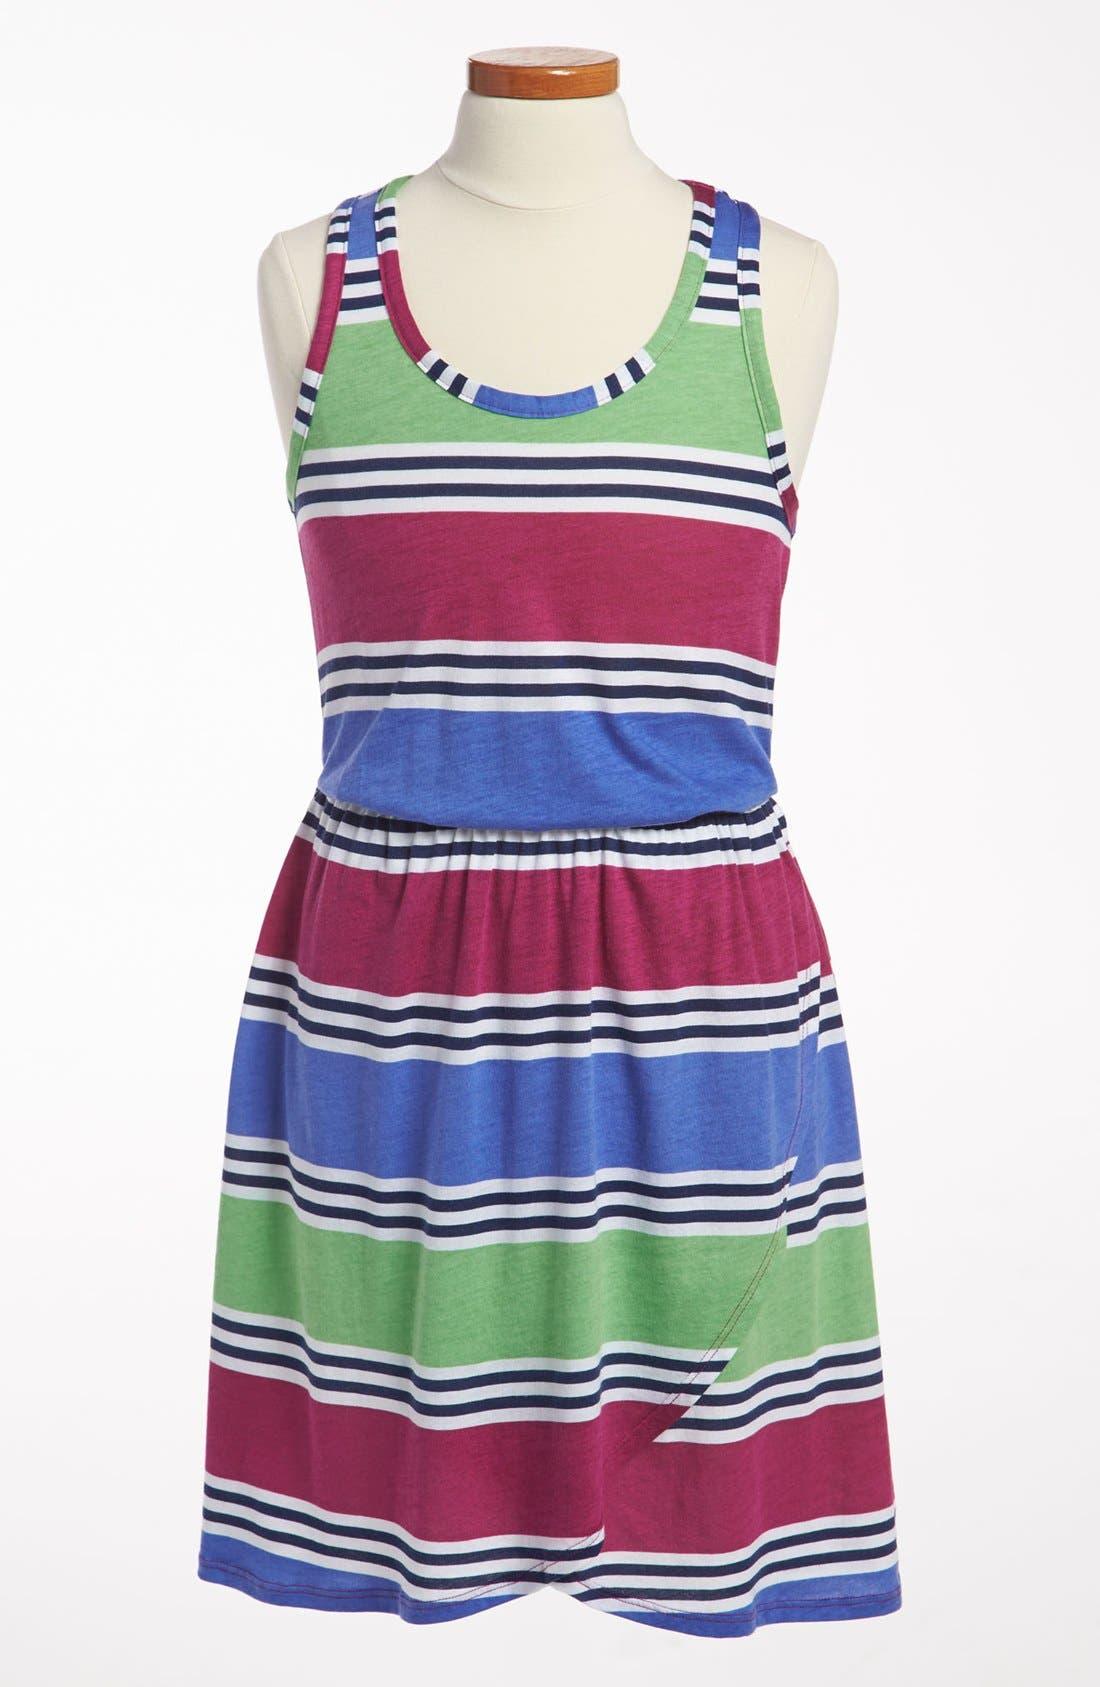 Main Image - Splendid 'Cabana Stripe' Dress (Big Girls)